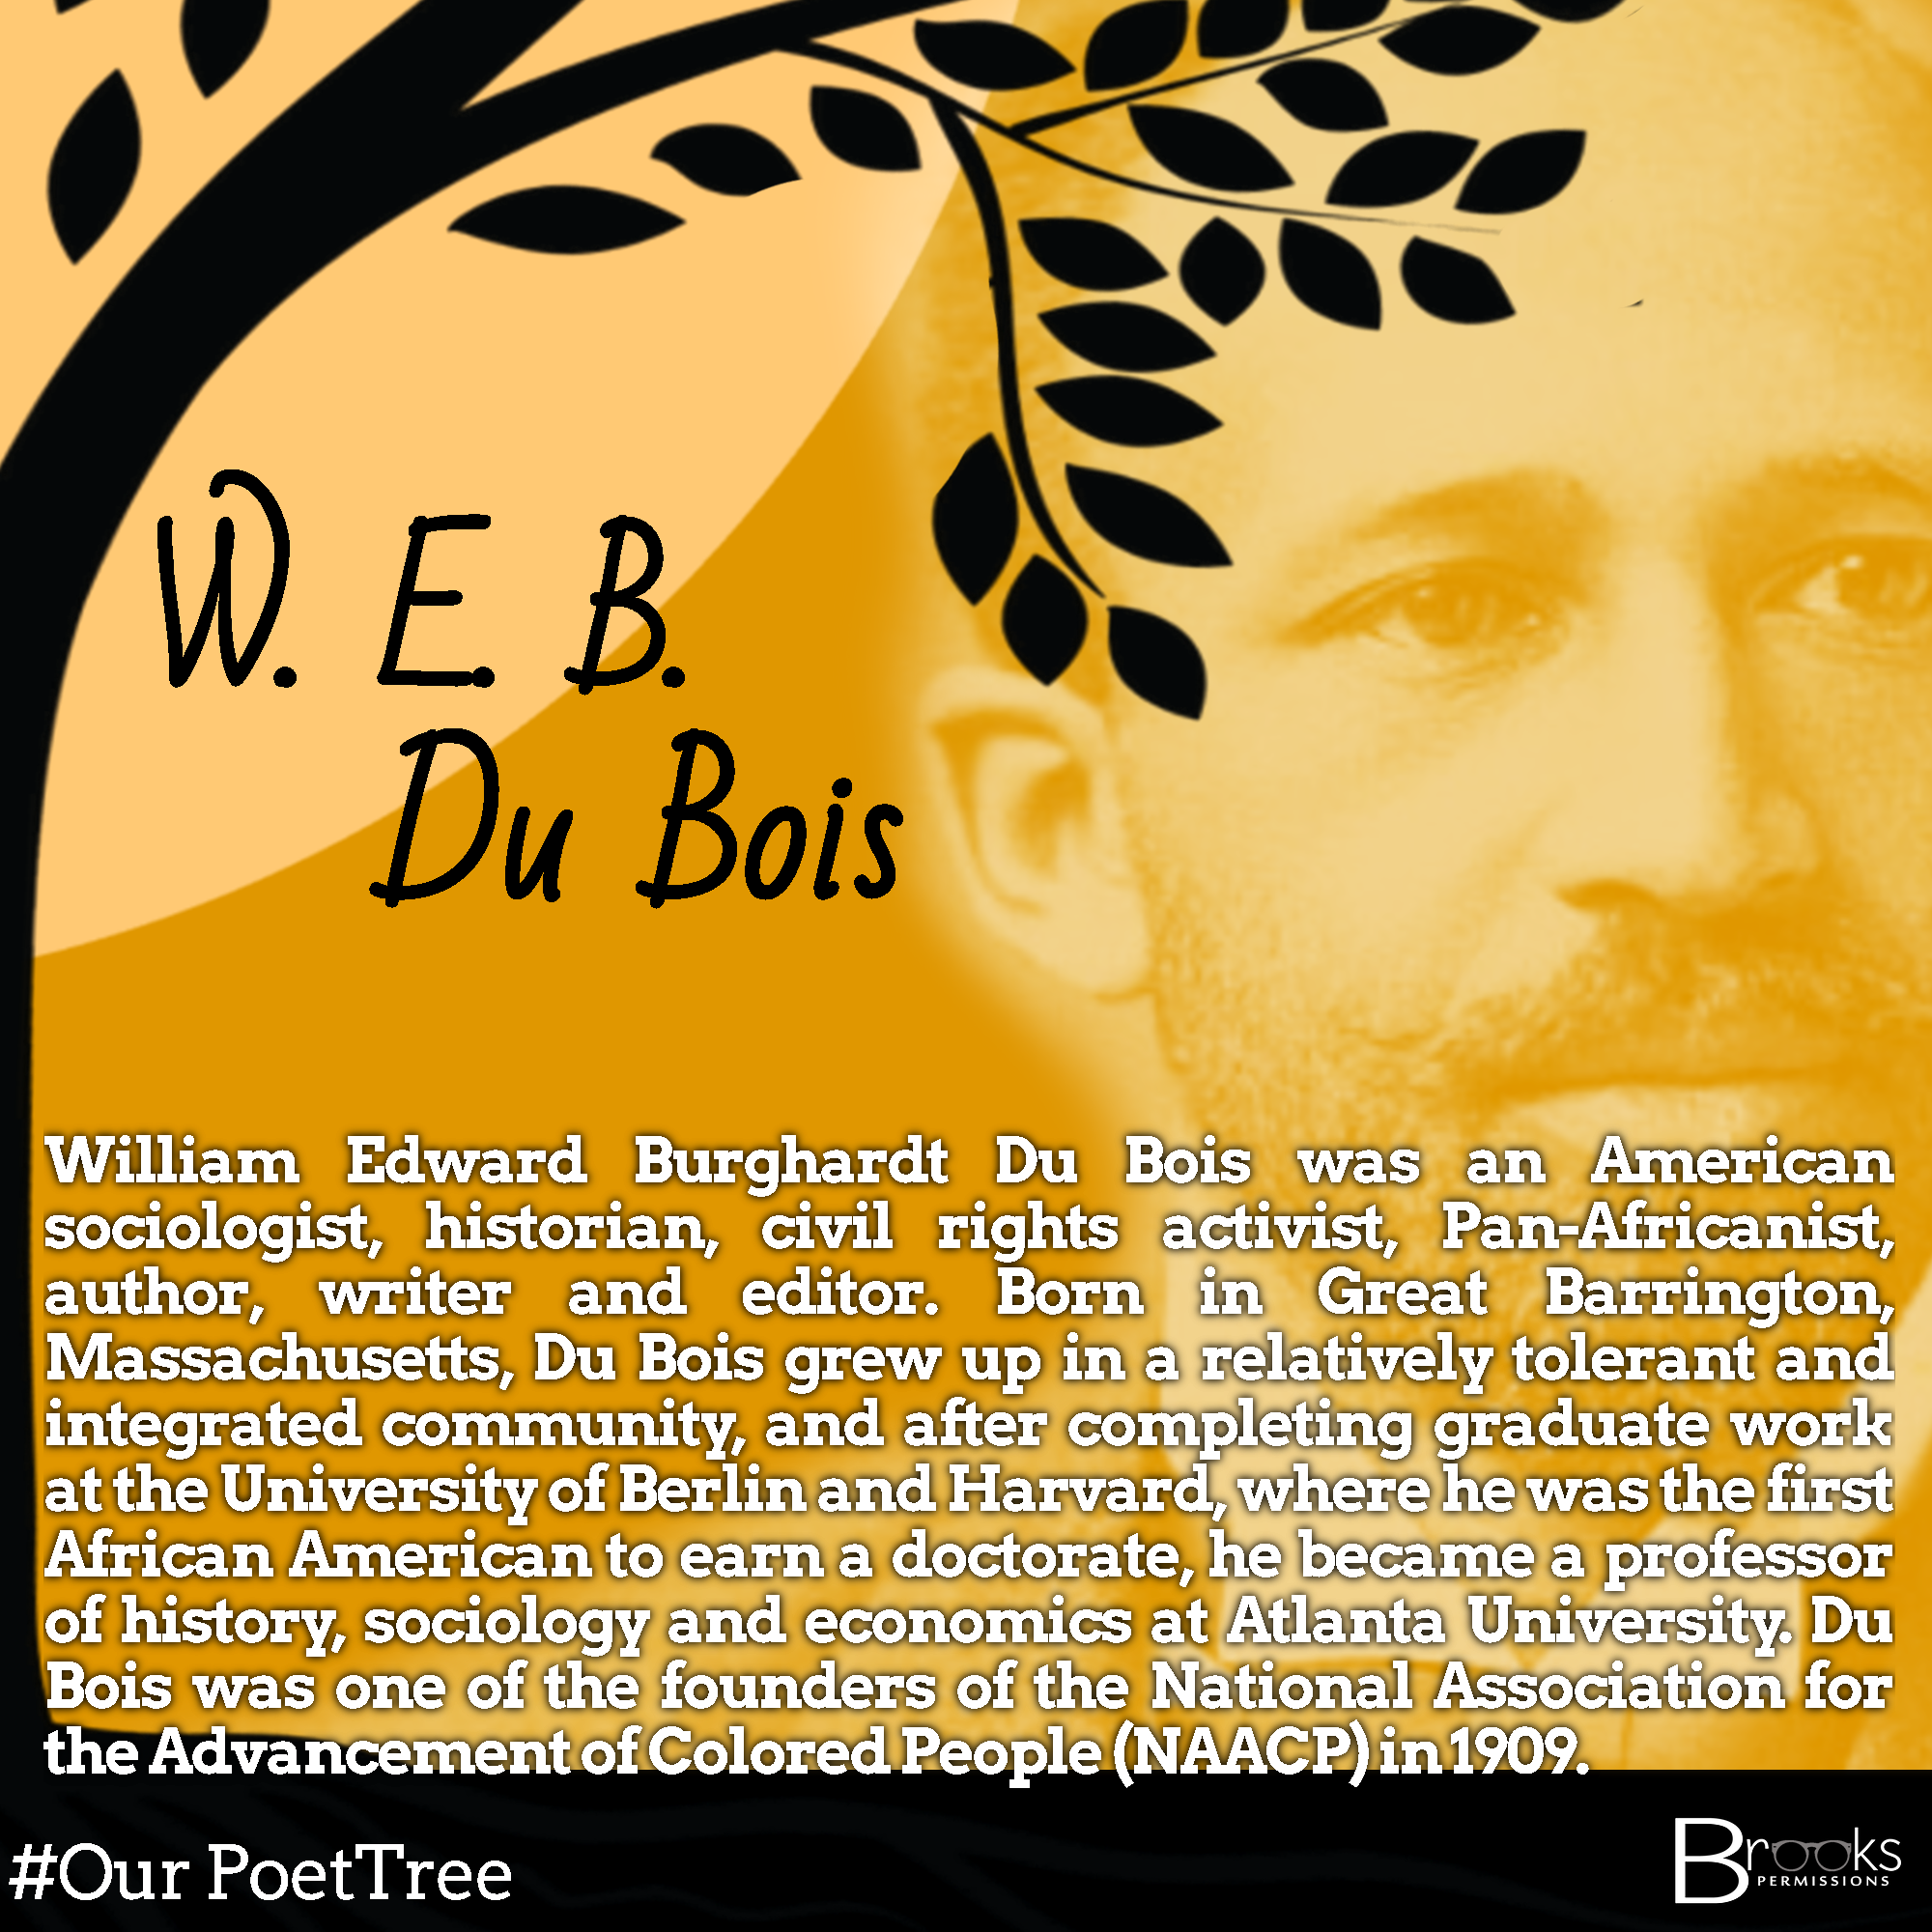 WEBDubois